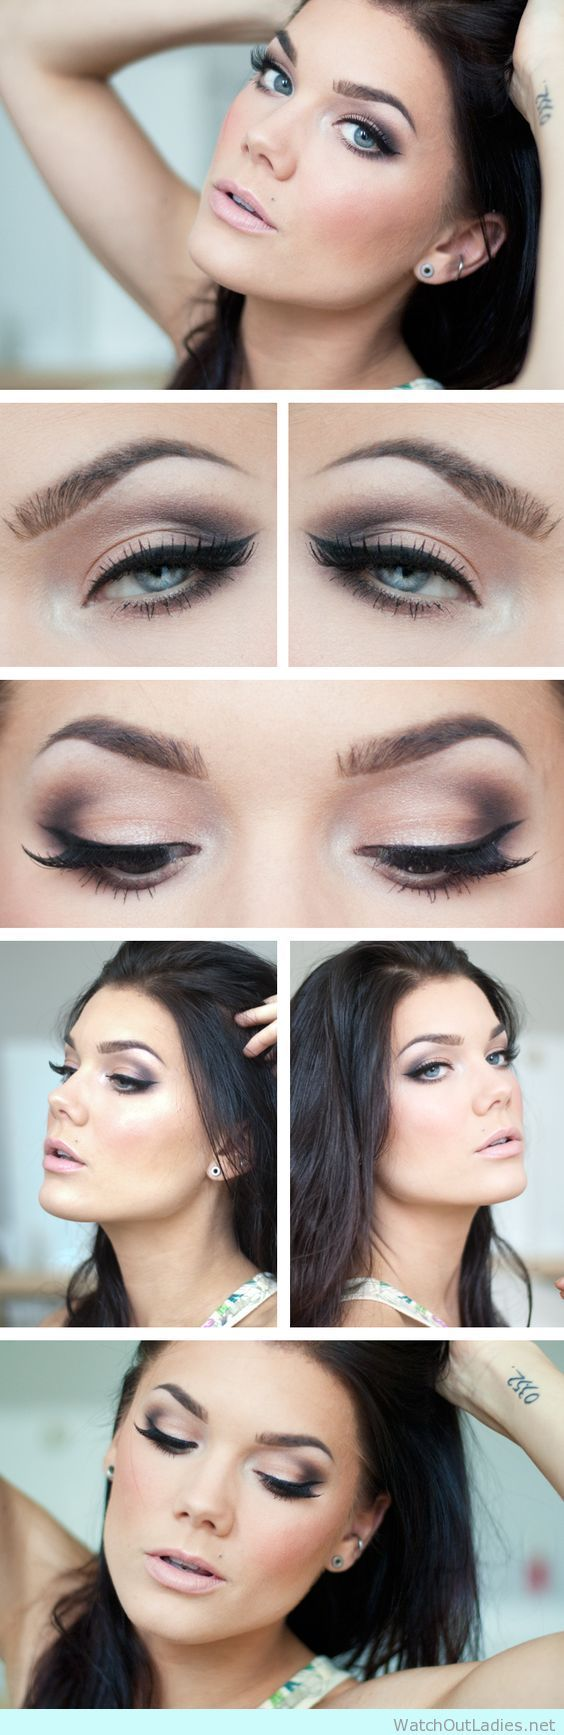 best make up u hair inspiration images on pinterest beauty